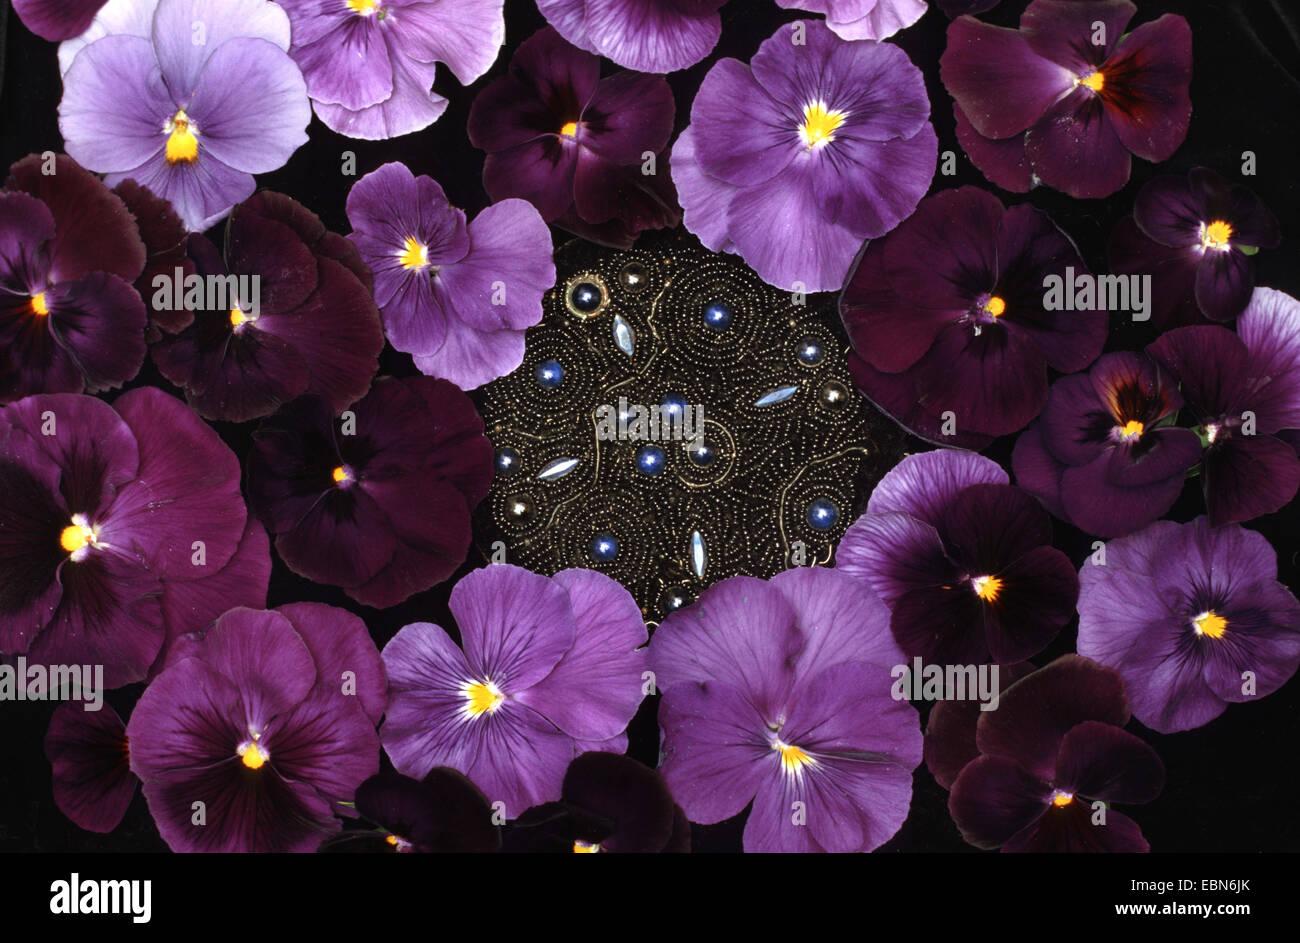 Pansy, Pansy Violet (Viola x wittrockiana, Viola wittrockiana, Viola hybrida), brooch with flowers of pansy - Stock Image